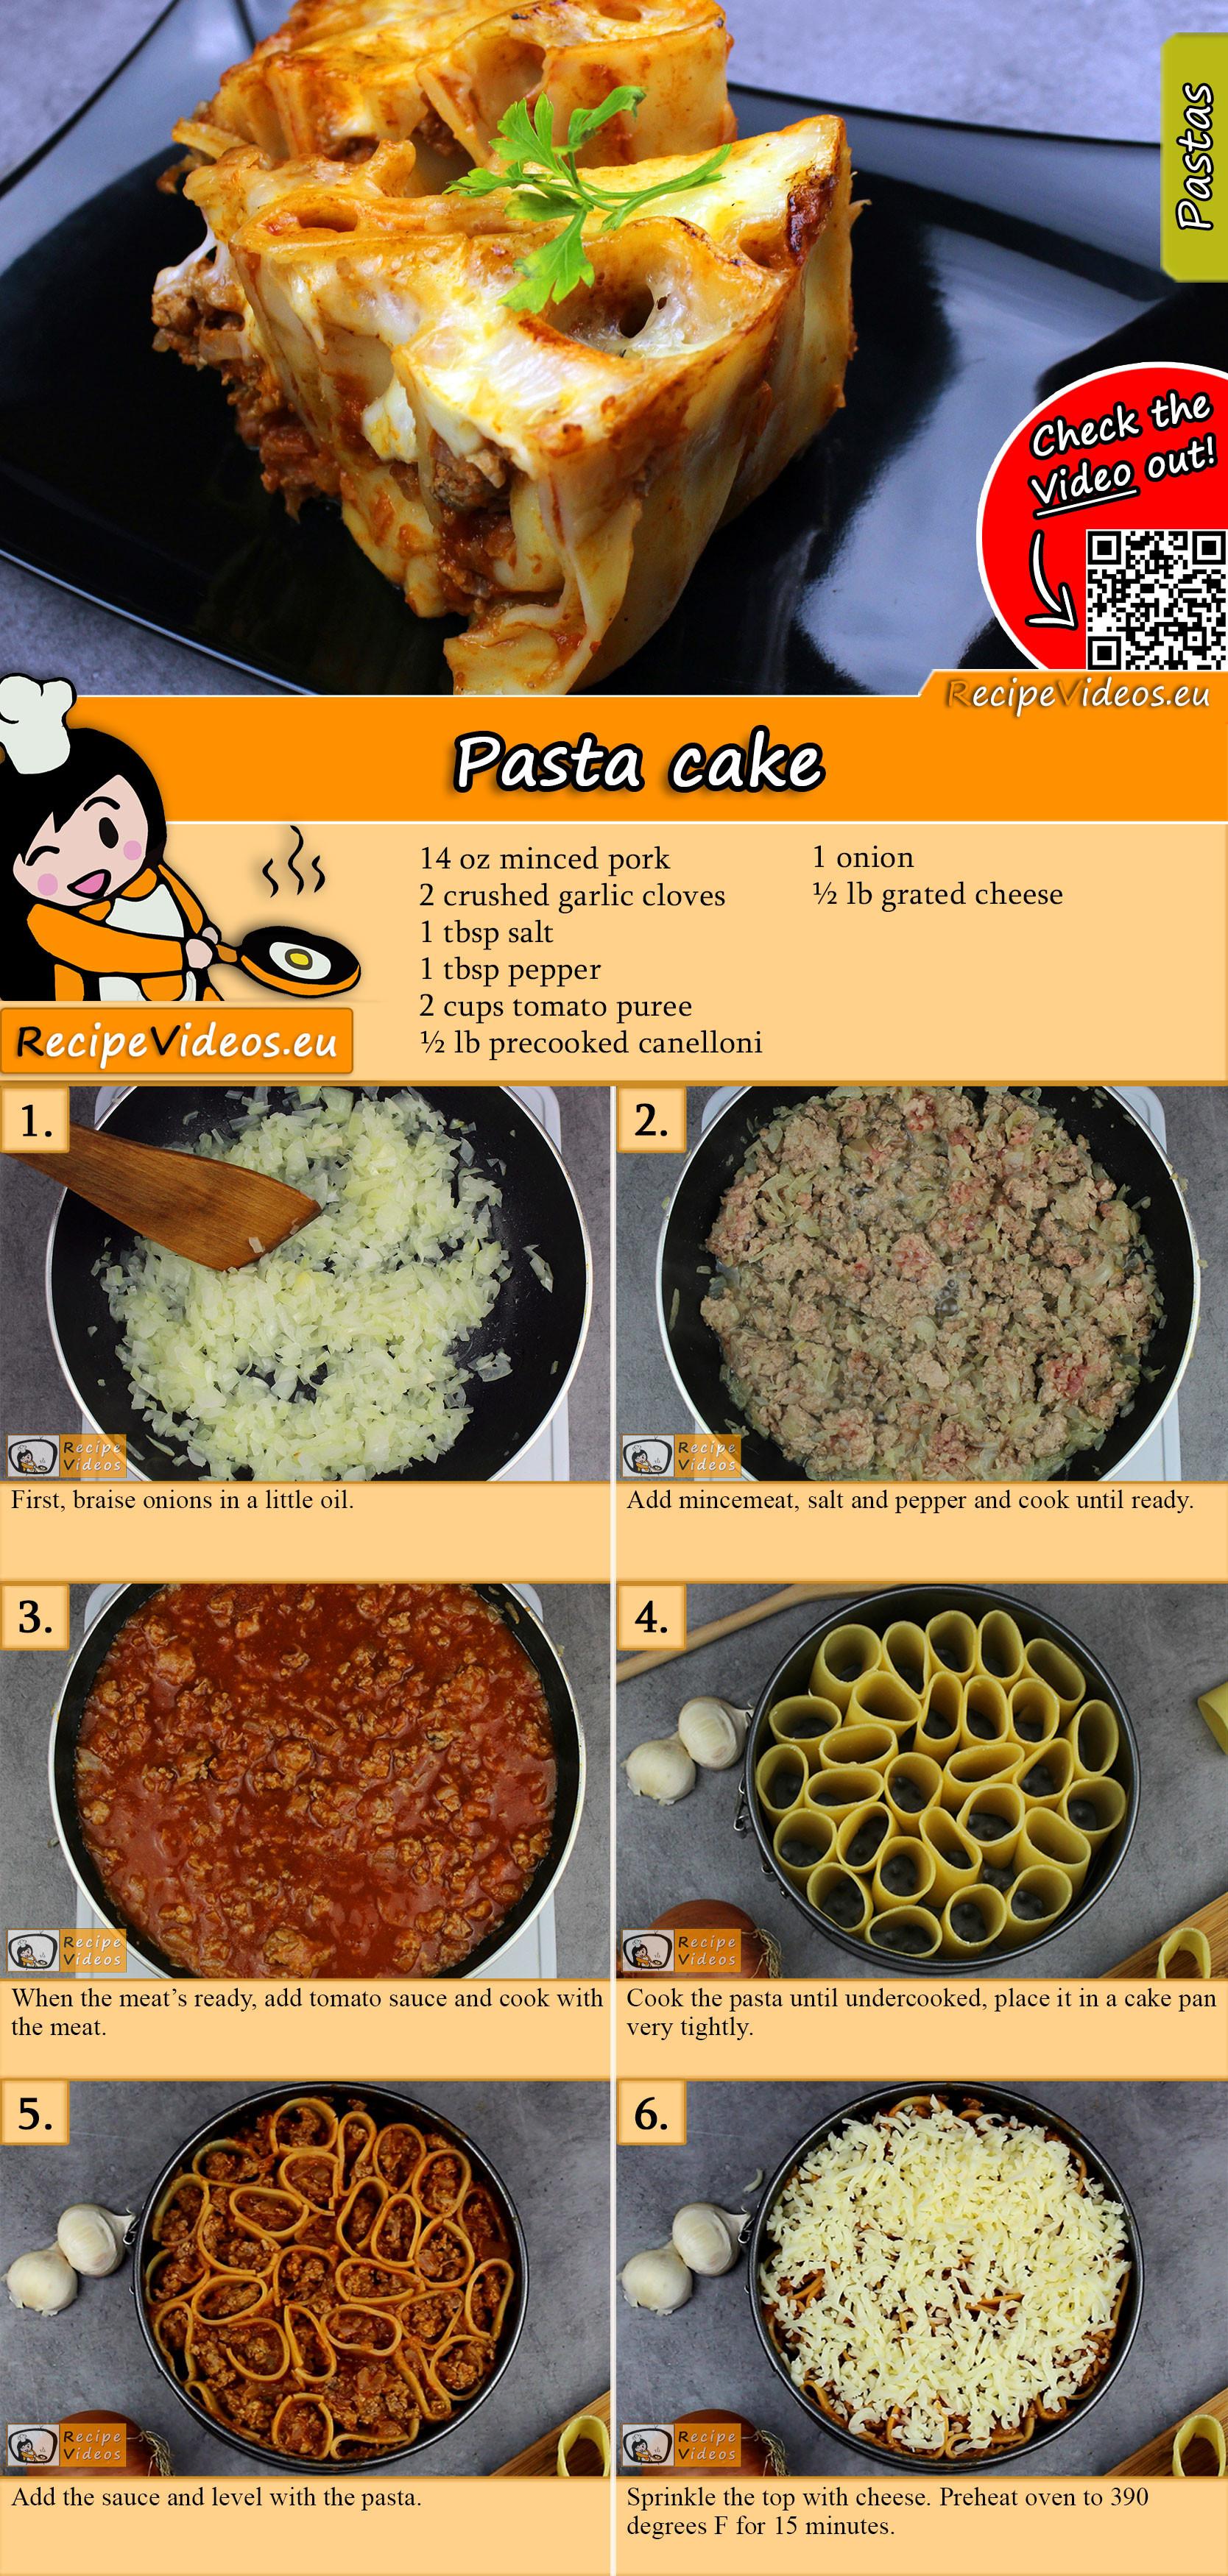 Pasta cake recipe with video